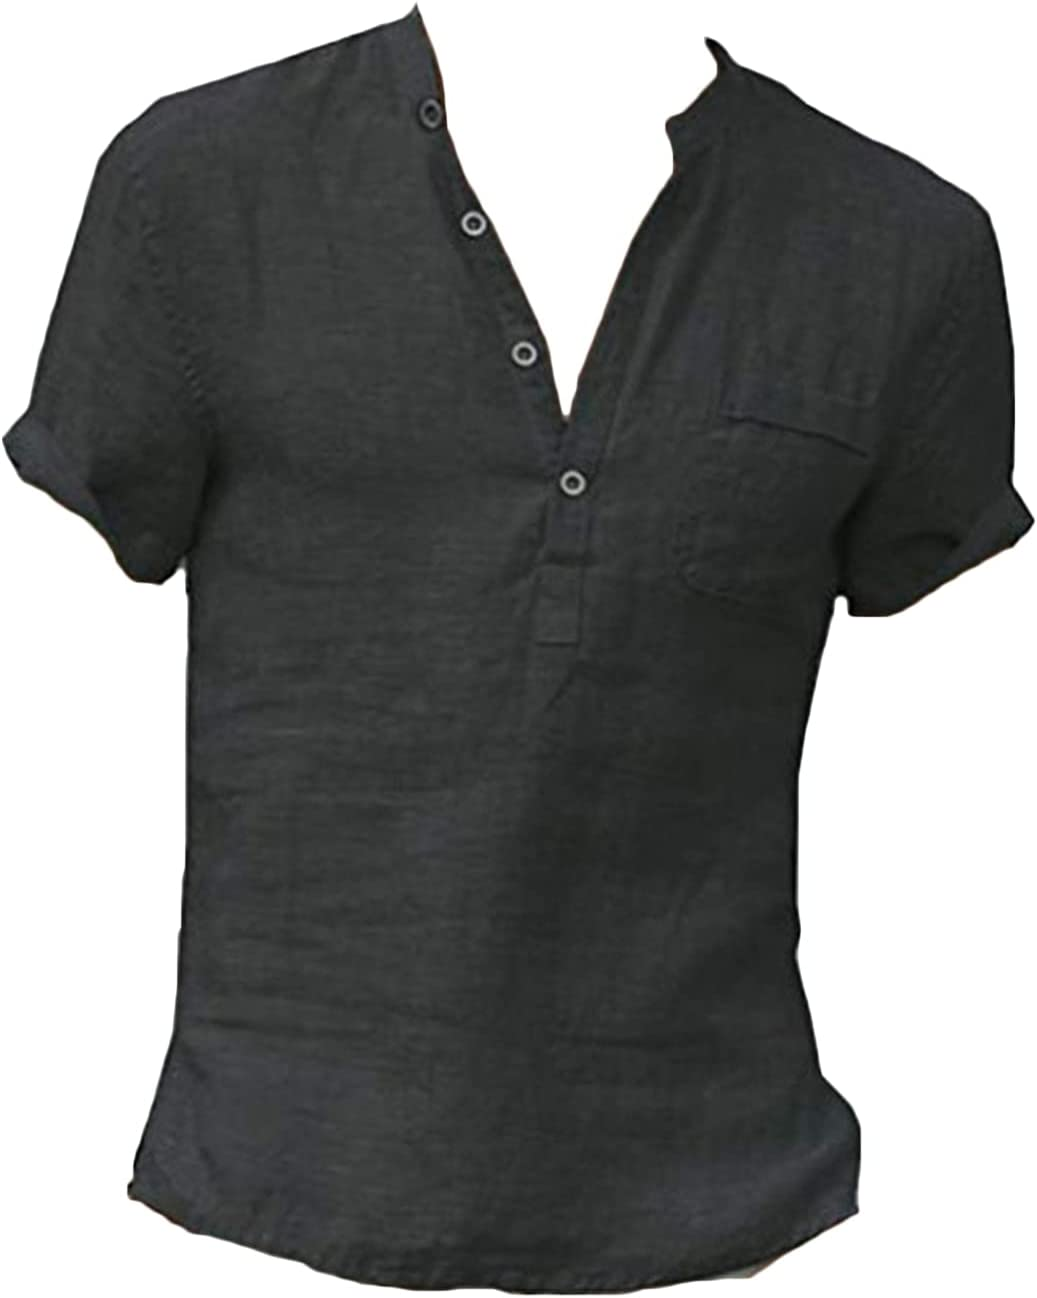 Men's Cotton Linen Henley Shirts Max 79% OFF Short Sh T Summer Sleeve Casual Selling